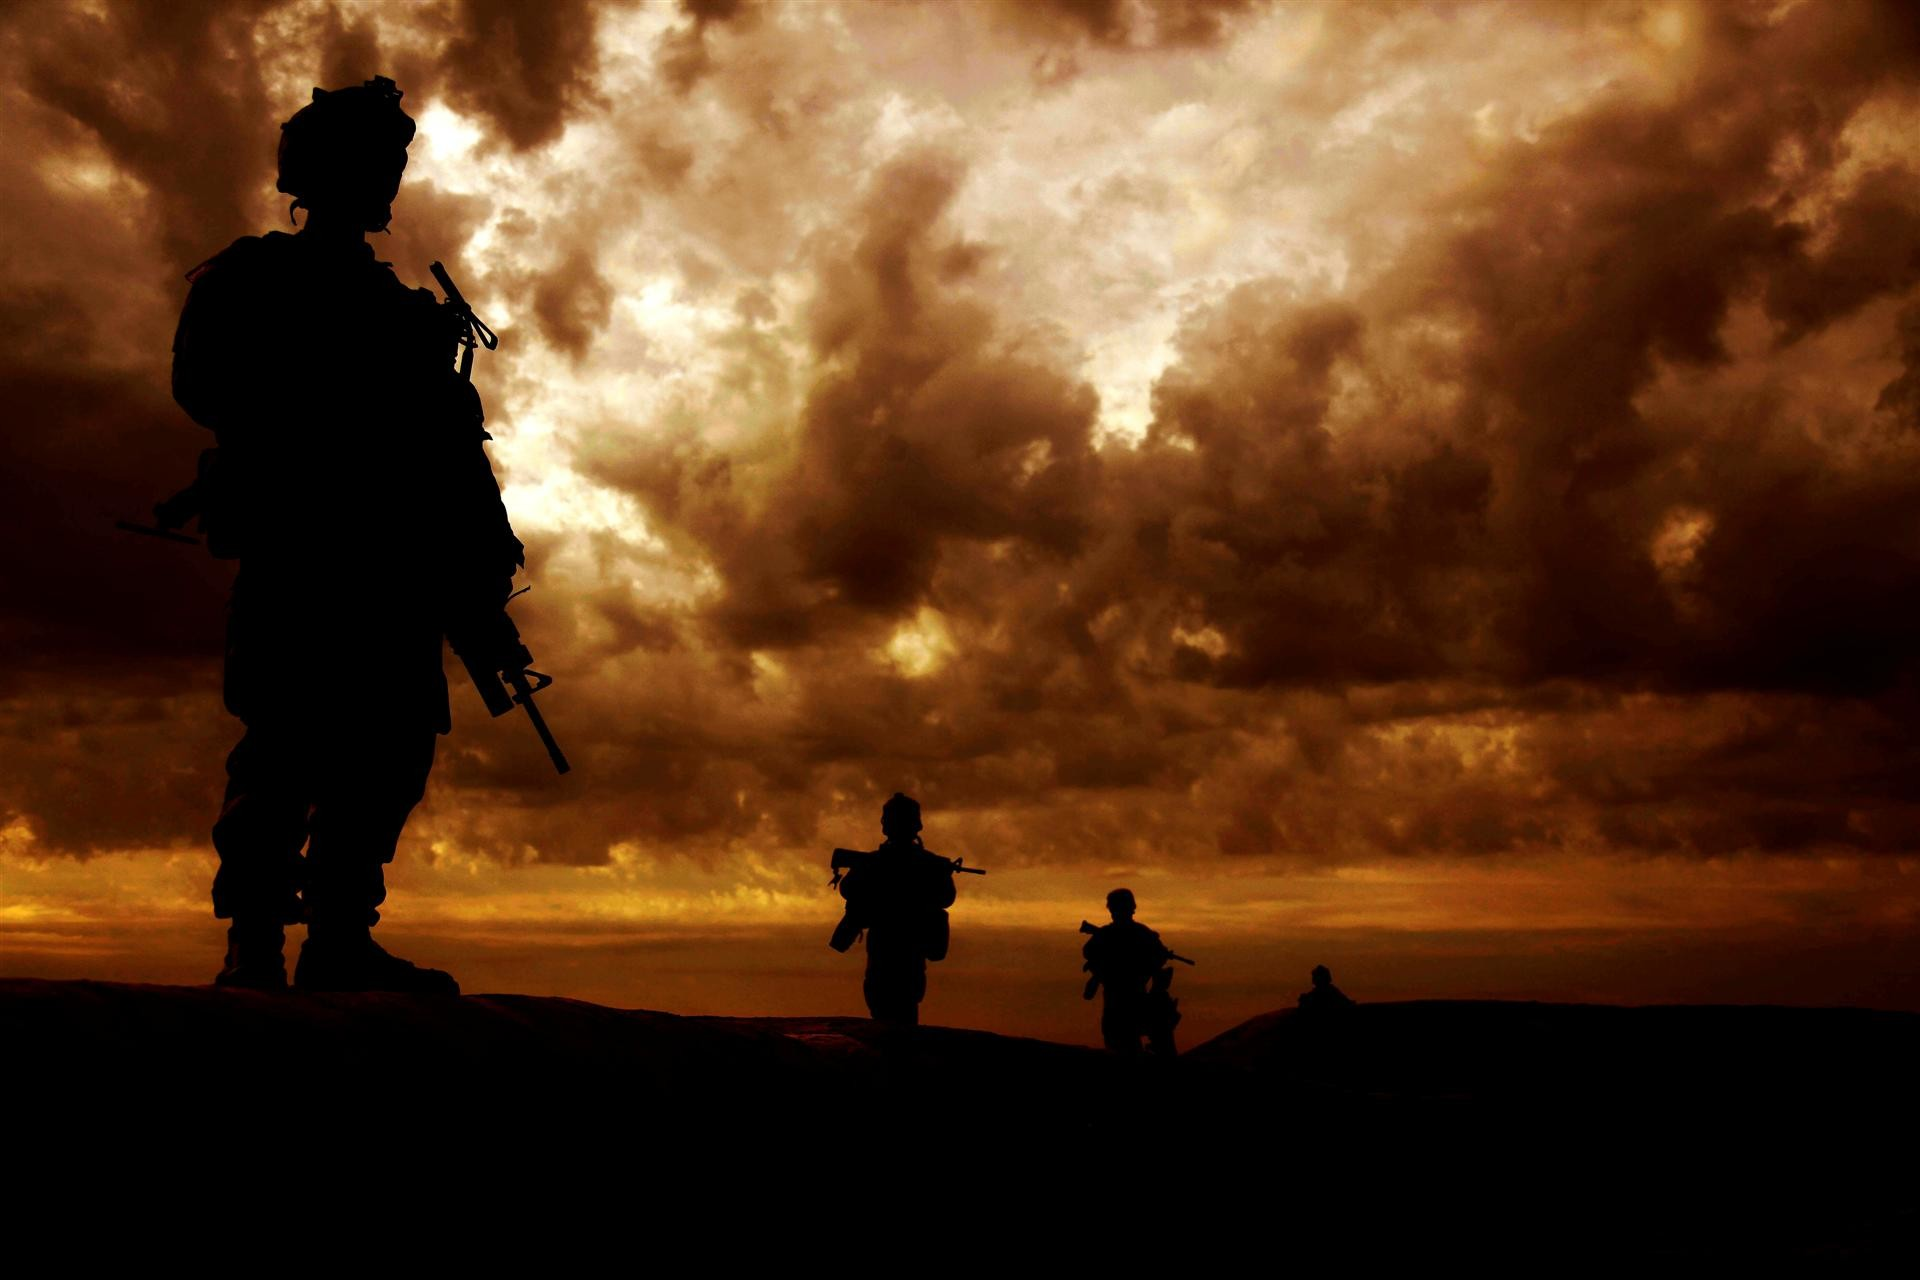 high-definition-wallpaper.com/photo/marine_corps_wallpaper_hd/19 .